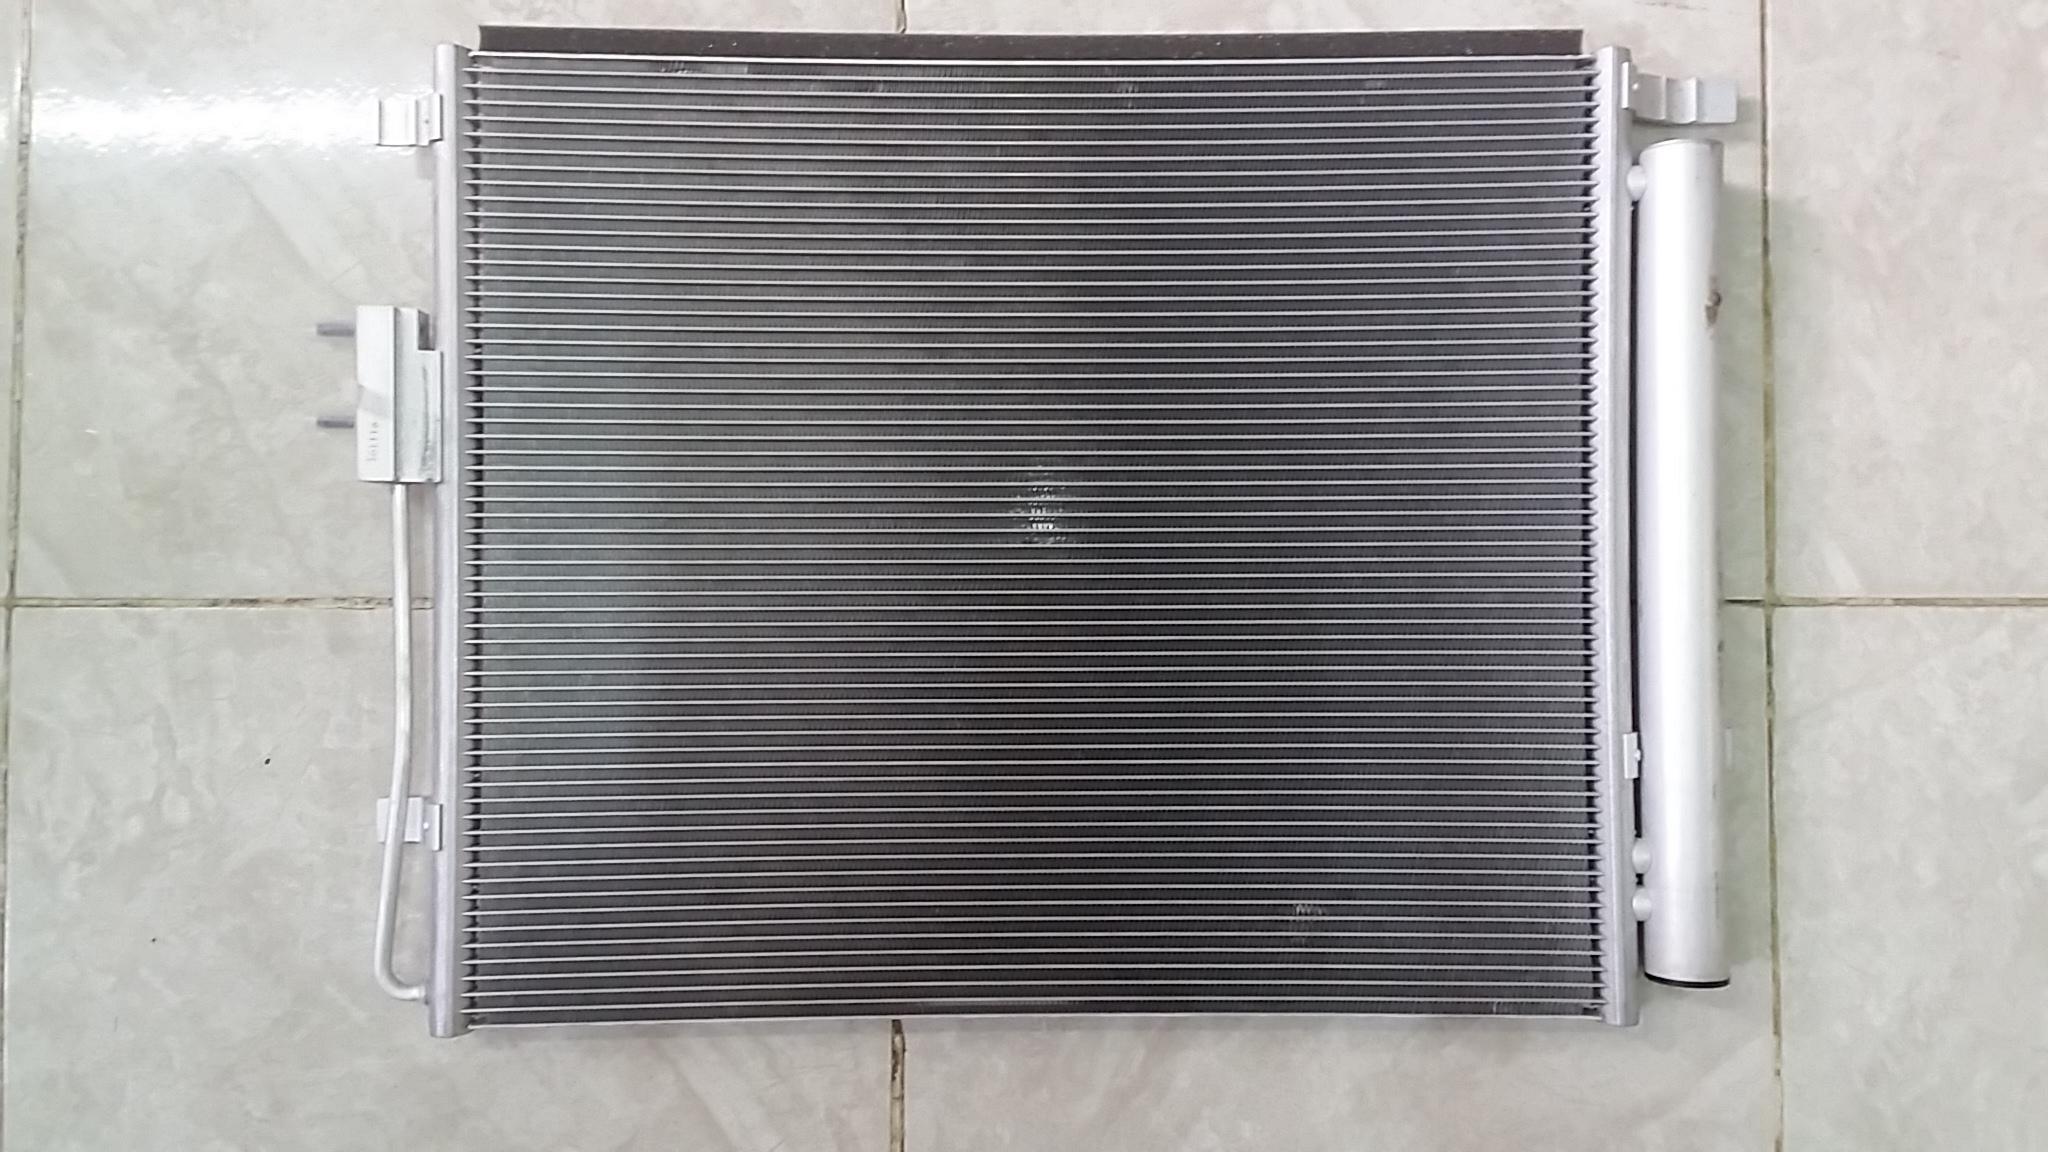 Dàn nóng - Hyundai Santafe 2013 - Condenser